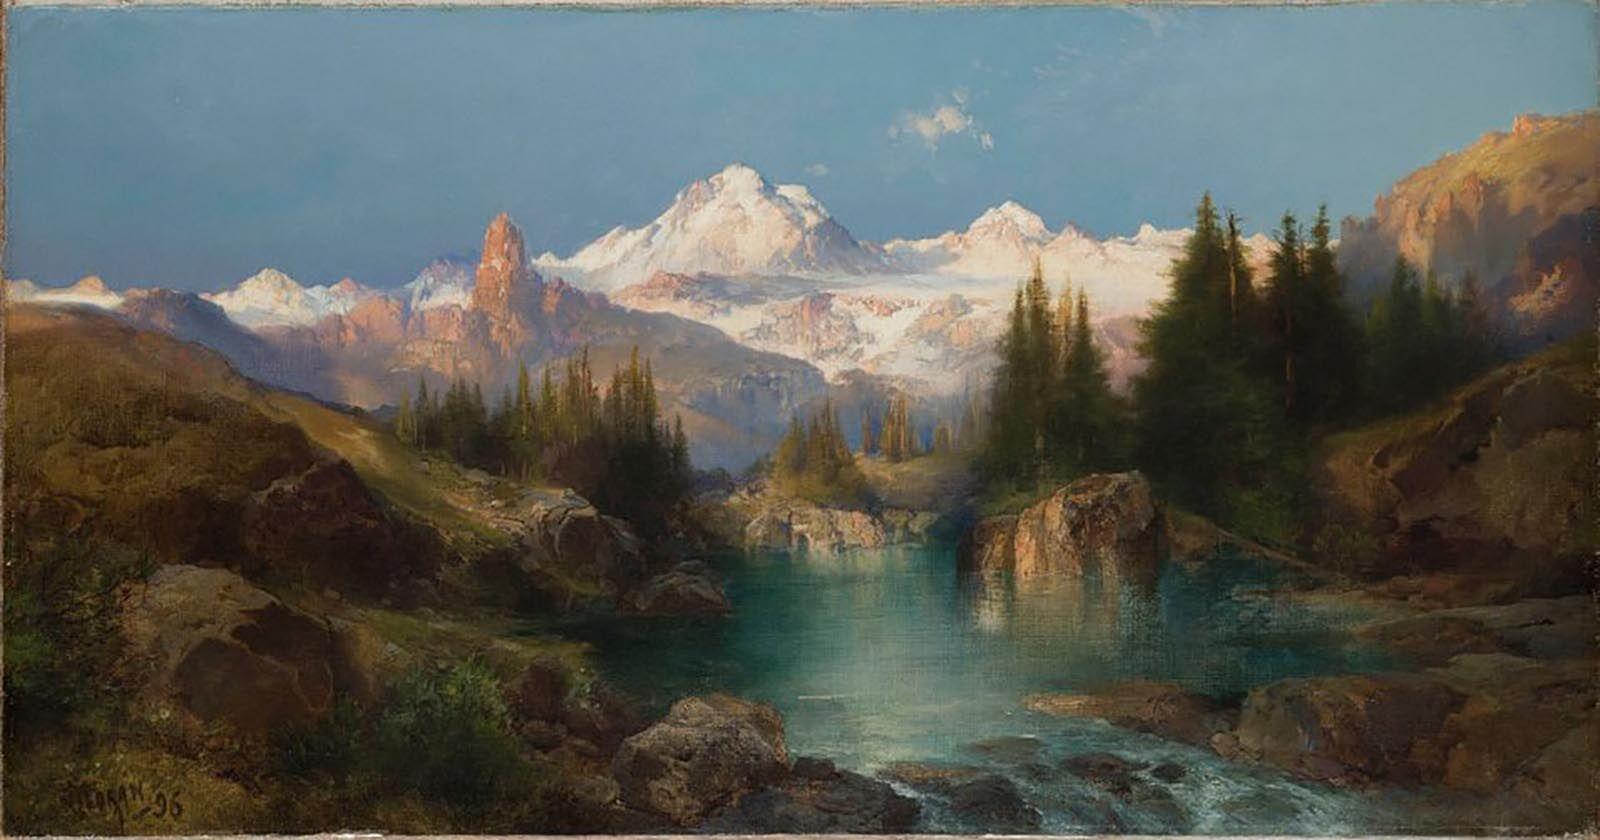 Thomas Moran, Snowy Range, 1896, Denver Art Museum